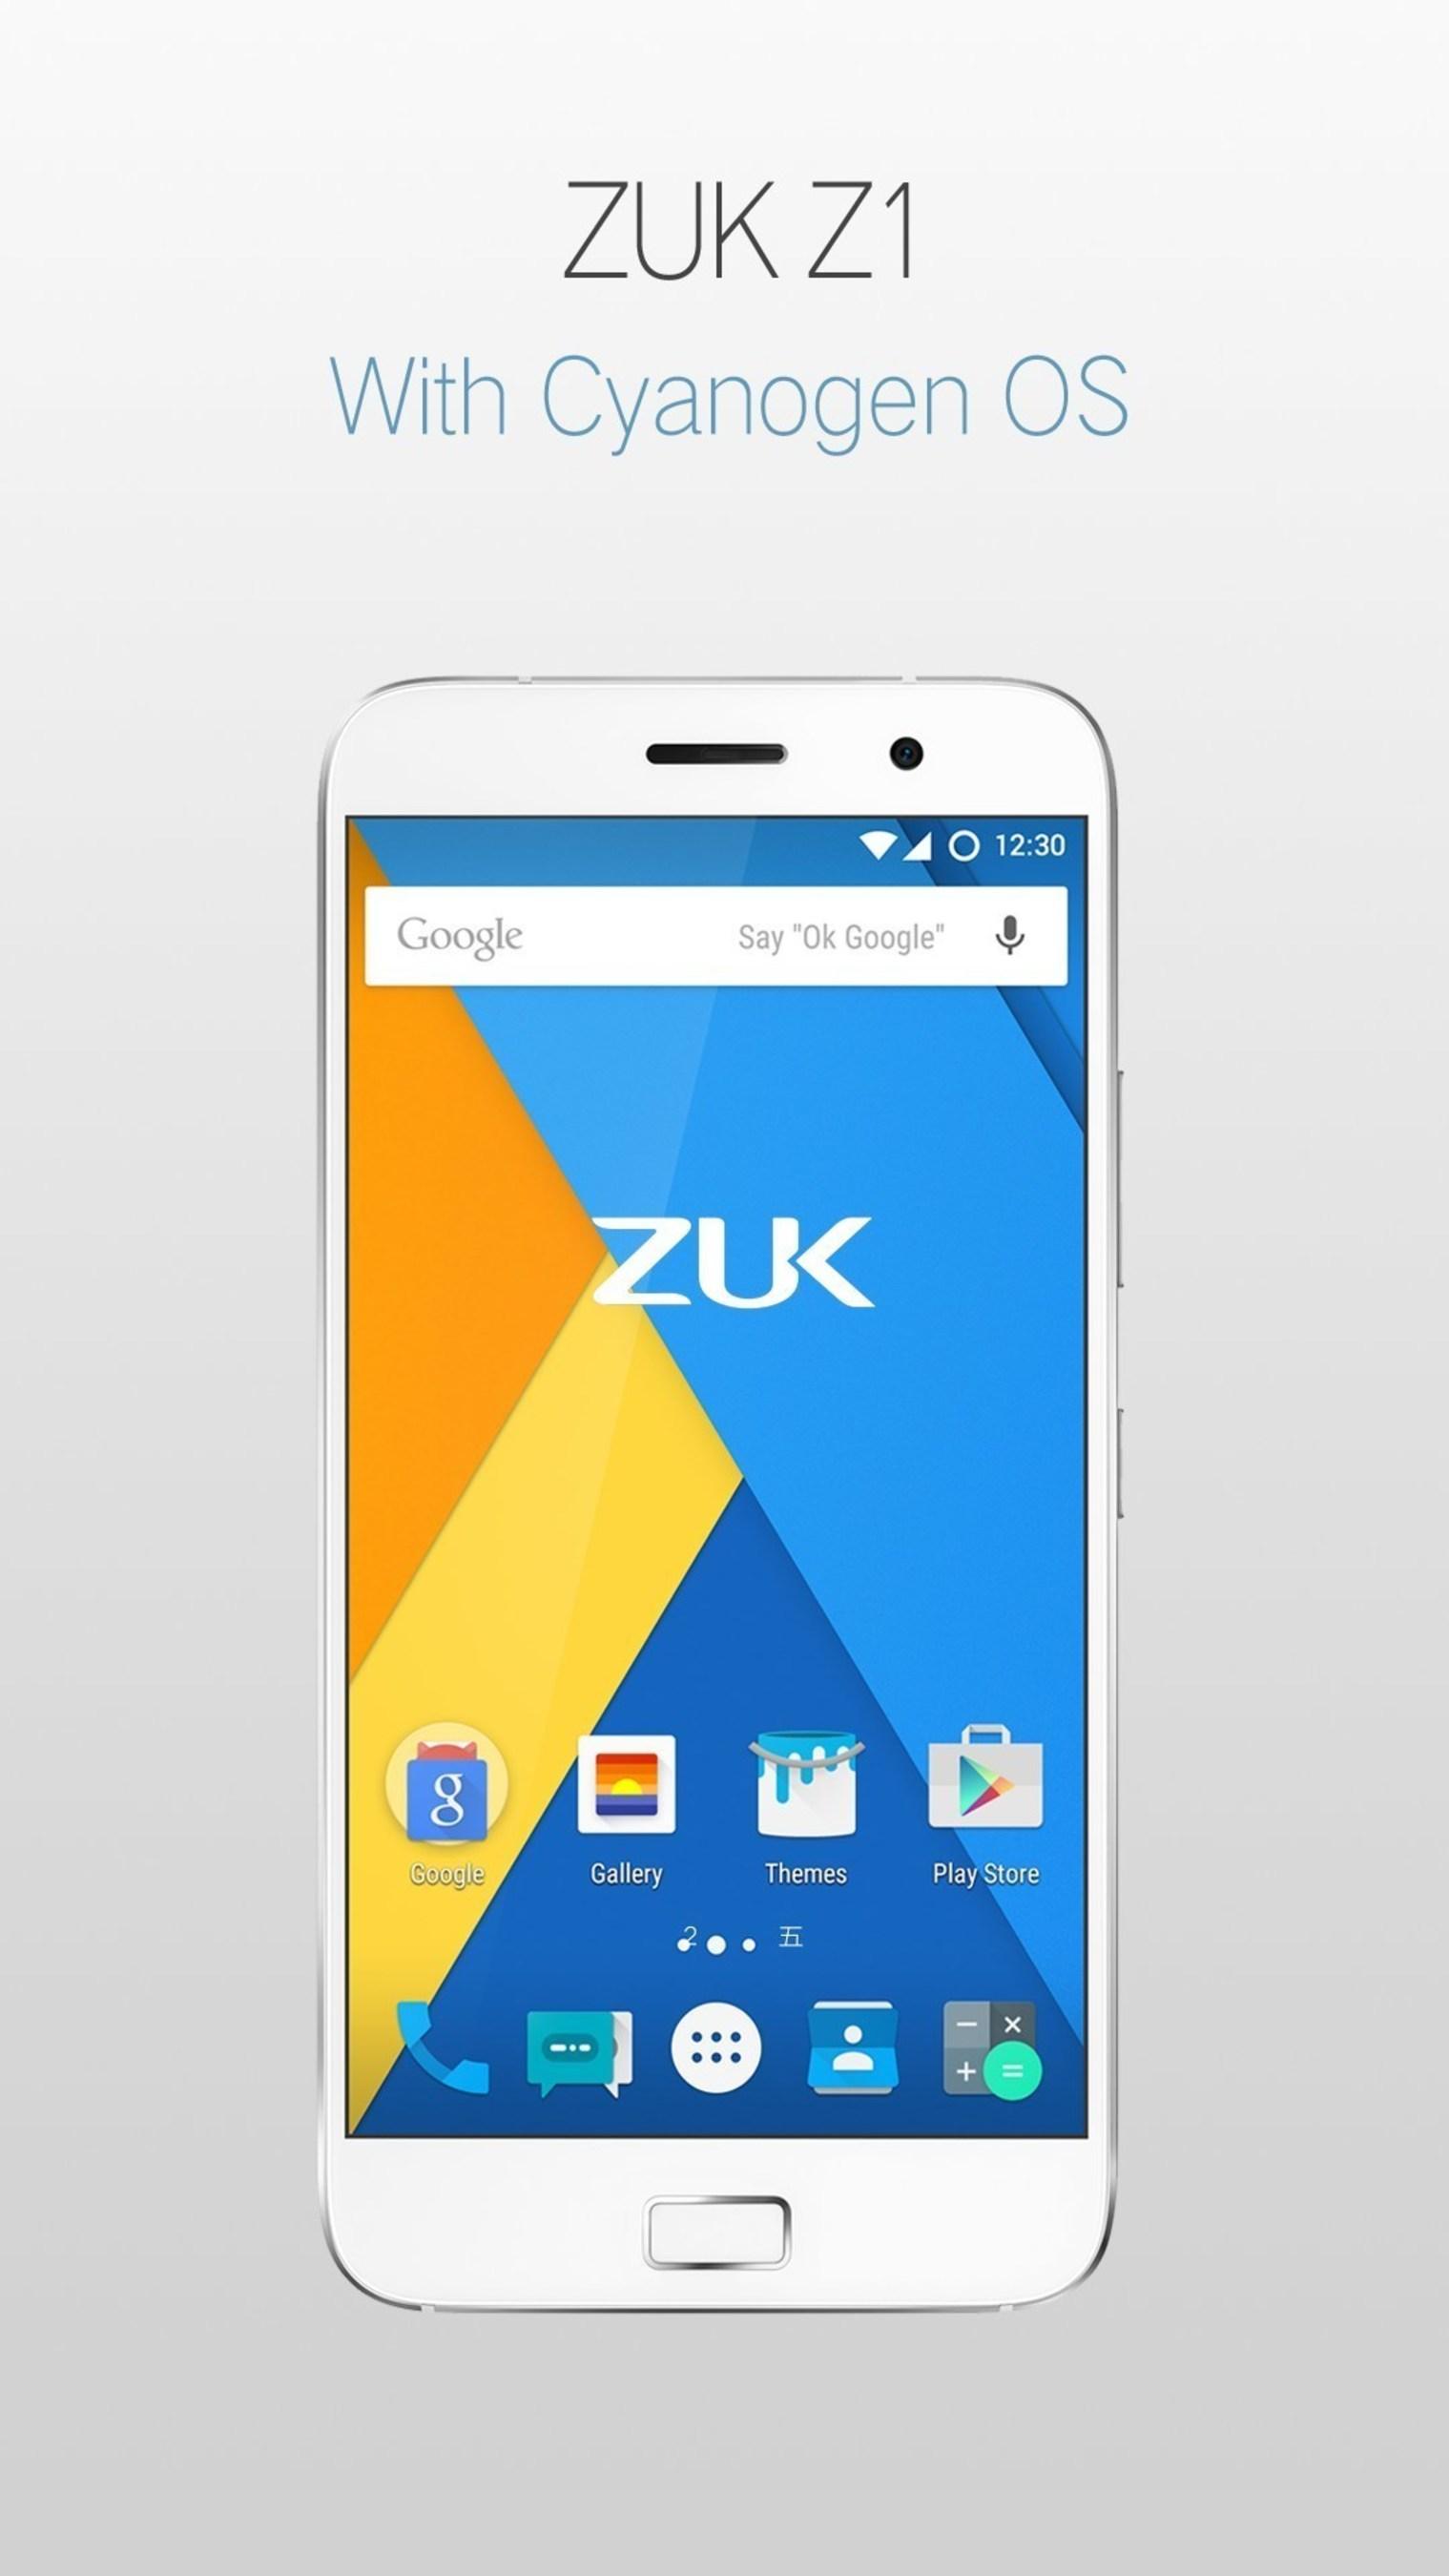 ZUK Z1 International Version Preloaded with Cyanogen OS Will Go On Sale in September